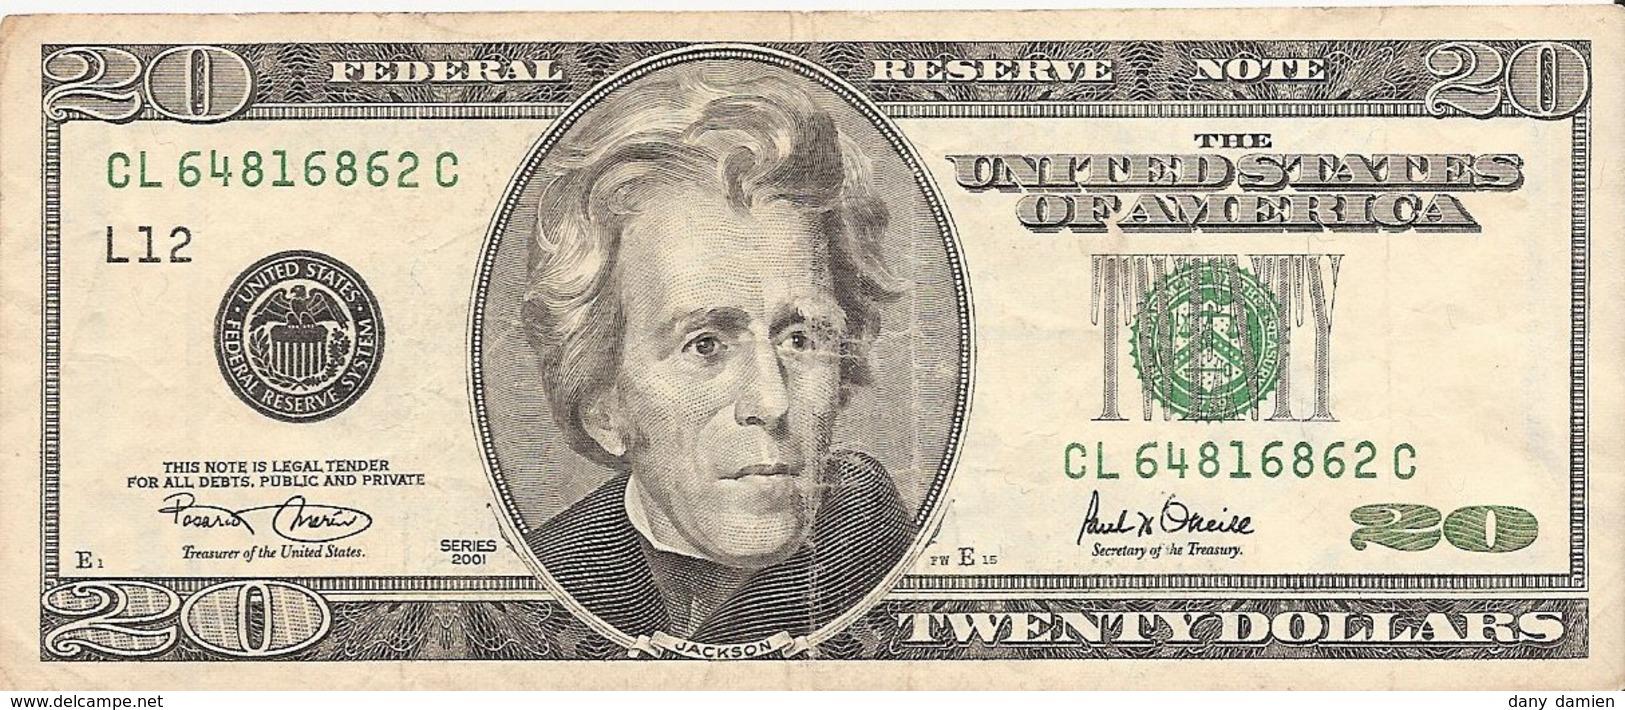 Etats-Unis (United States Of America) - Billet De 20 Dollars - Serie 2001 - N° LC12 - Estados Unidos